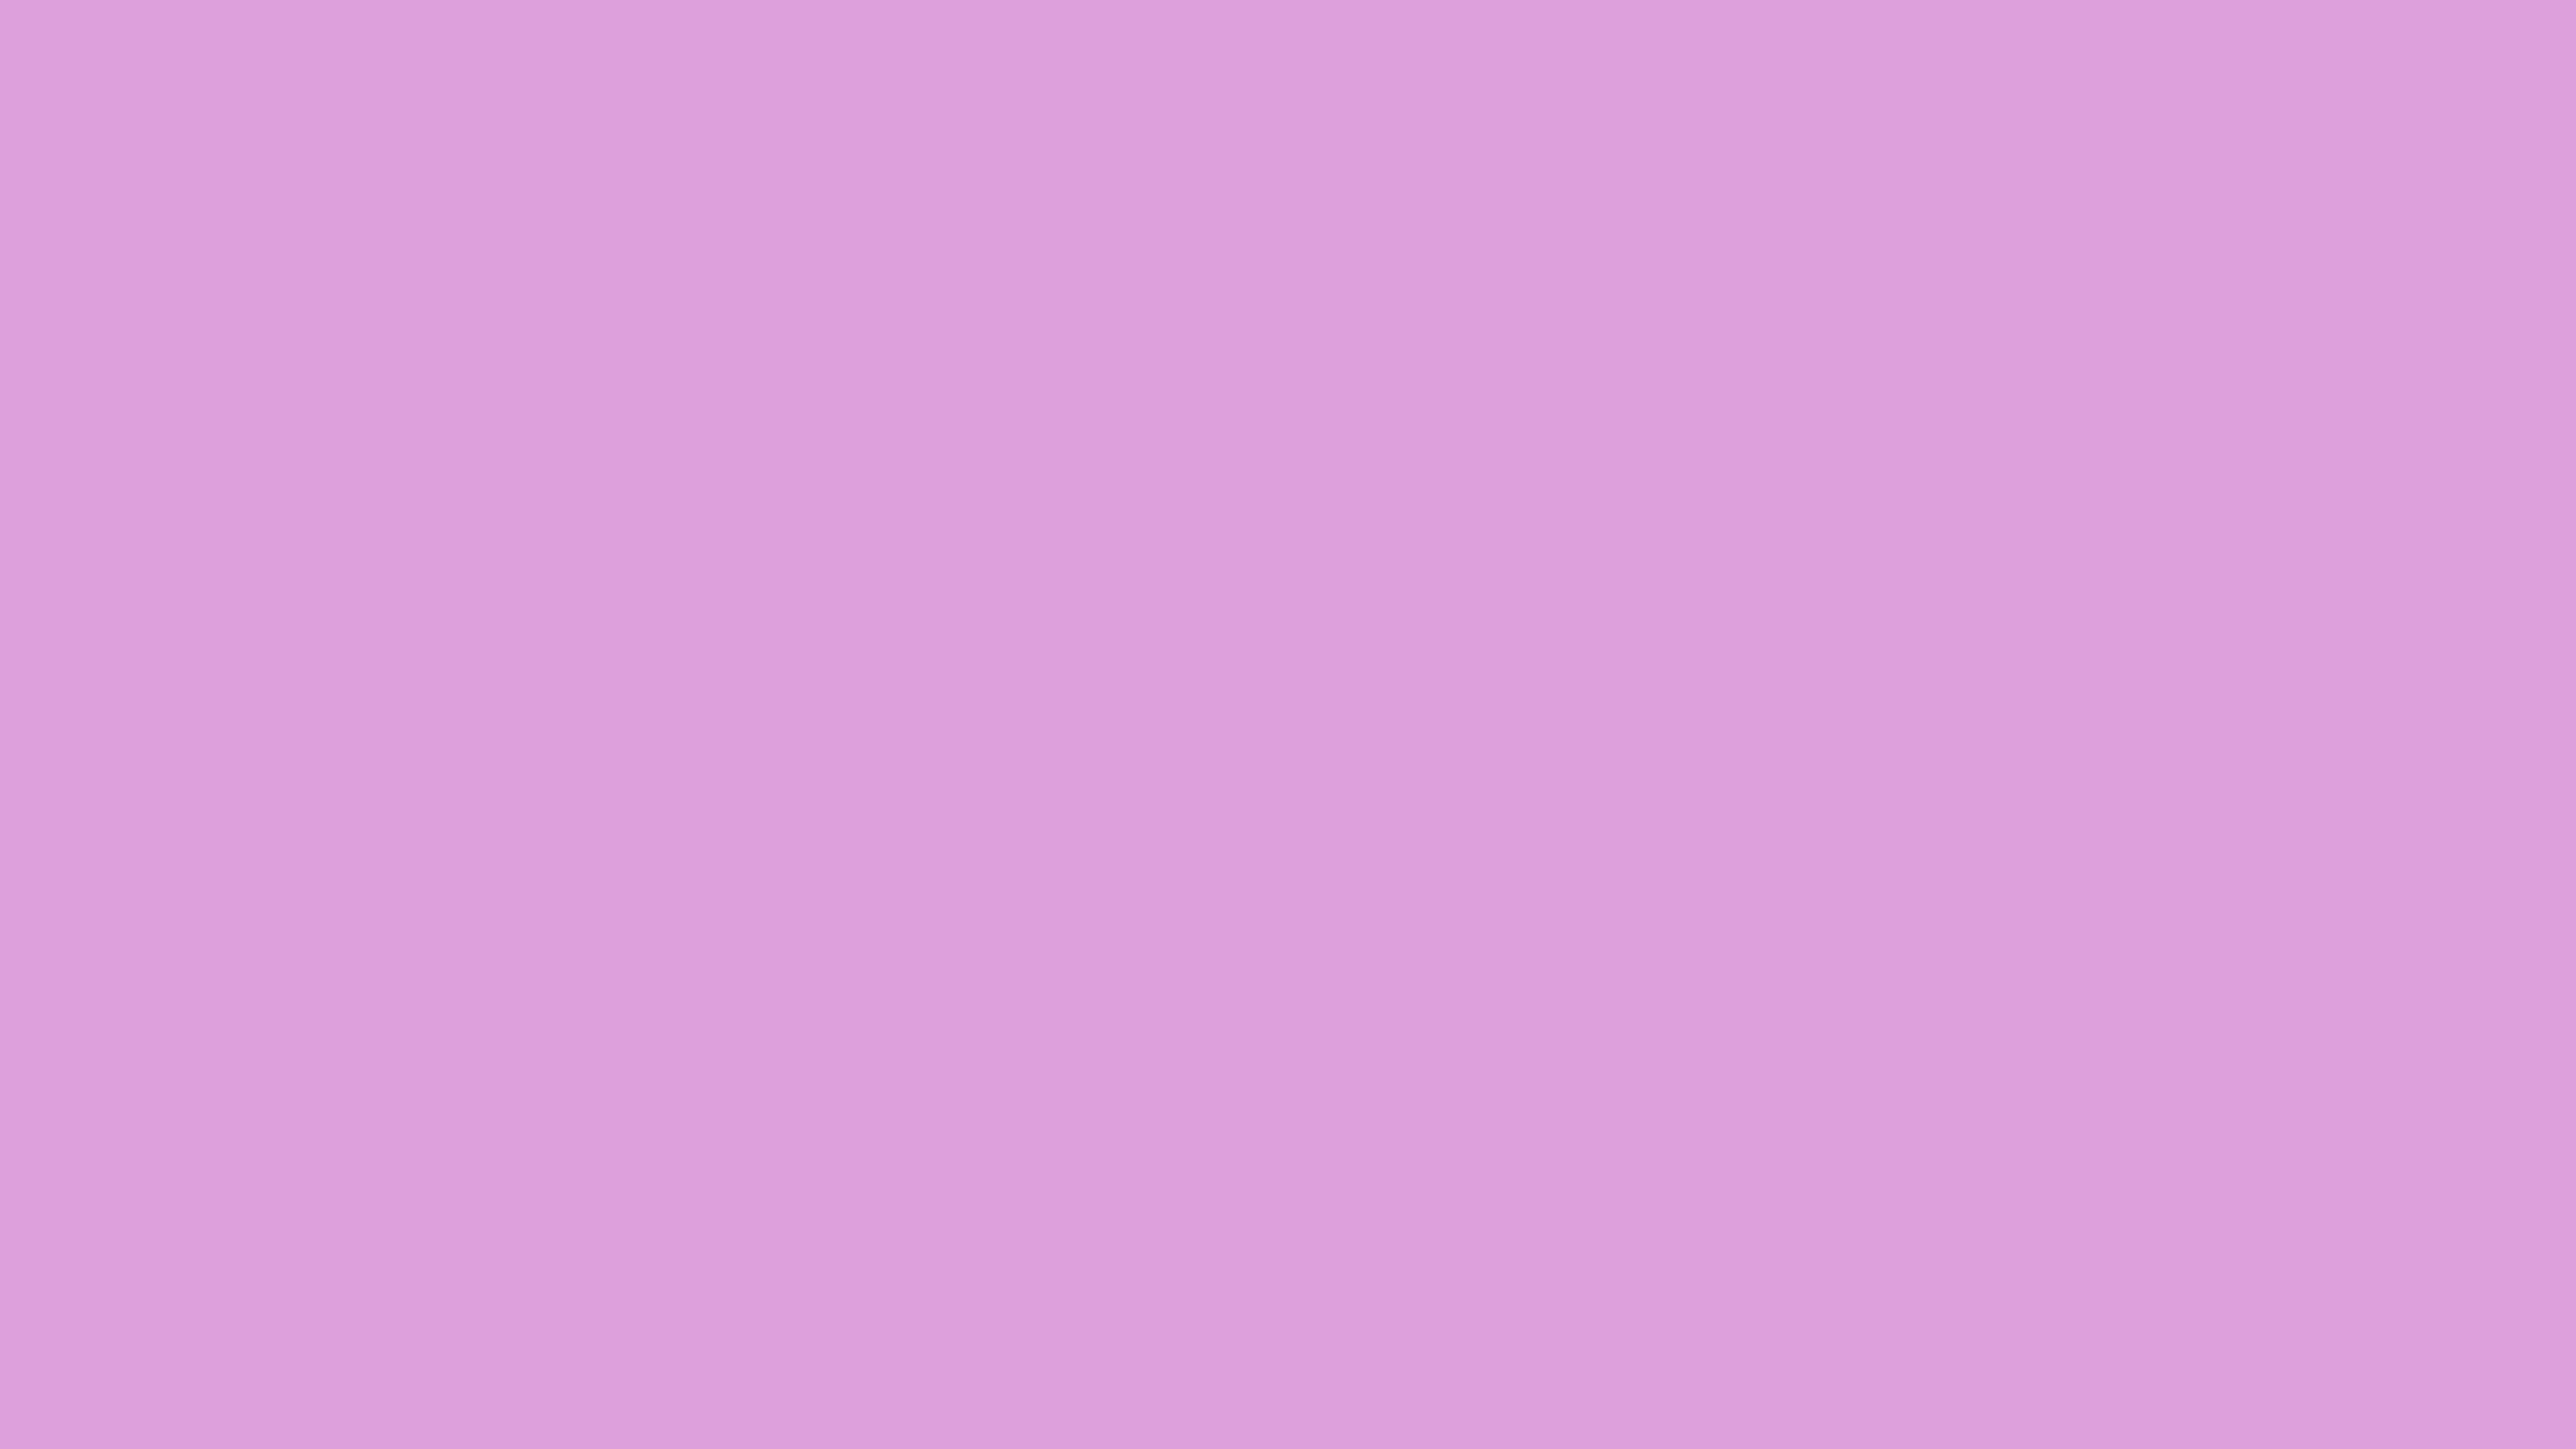 7680x4320 Medium Lavender Magenta Solid Color Background